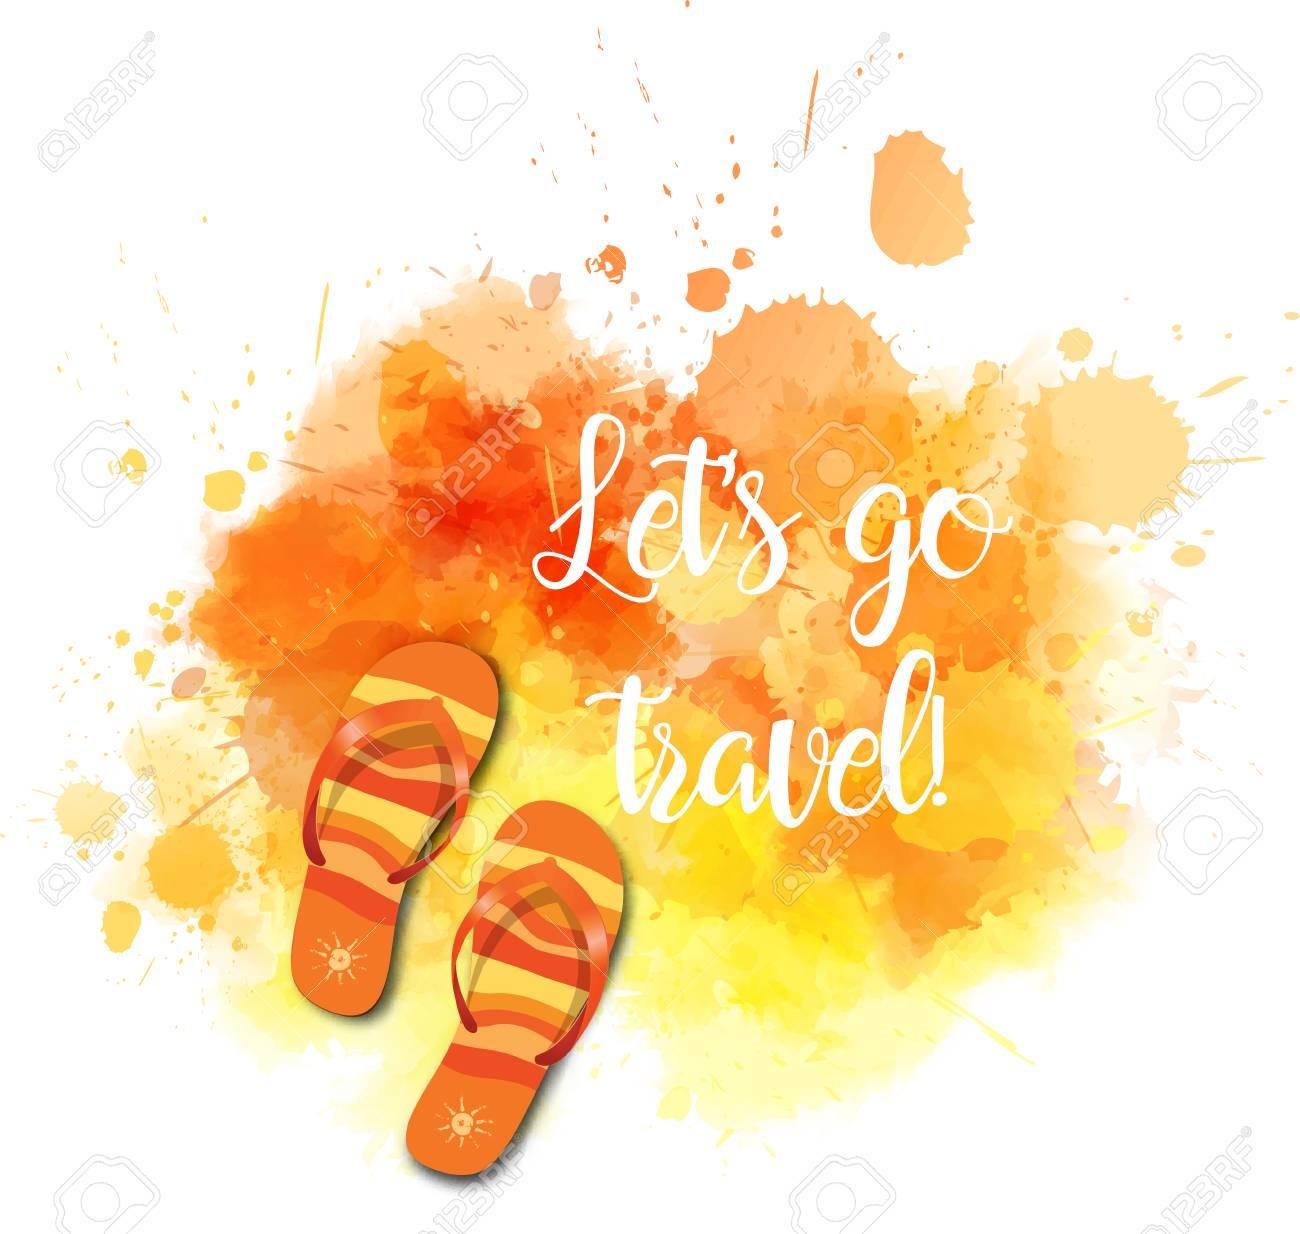 8628e086e853 Vector - Watercolor imitation splash with flip-flops and travel message.  Orange colored. Vector illustration.